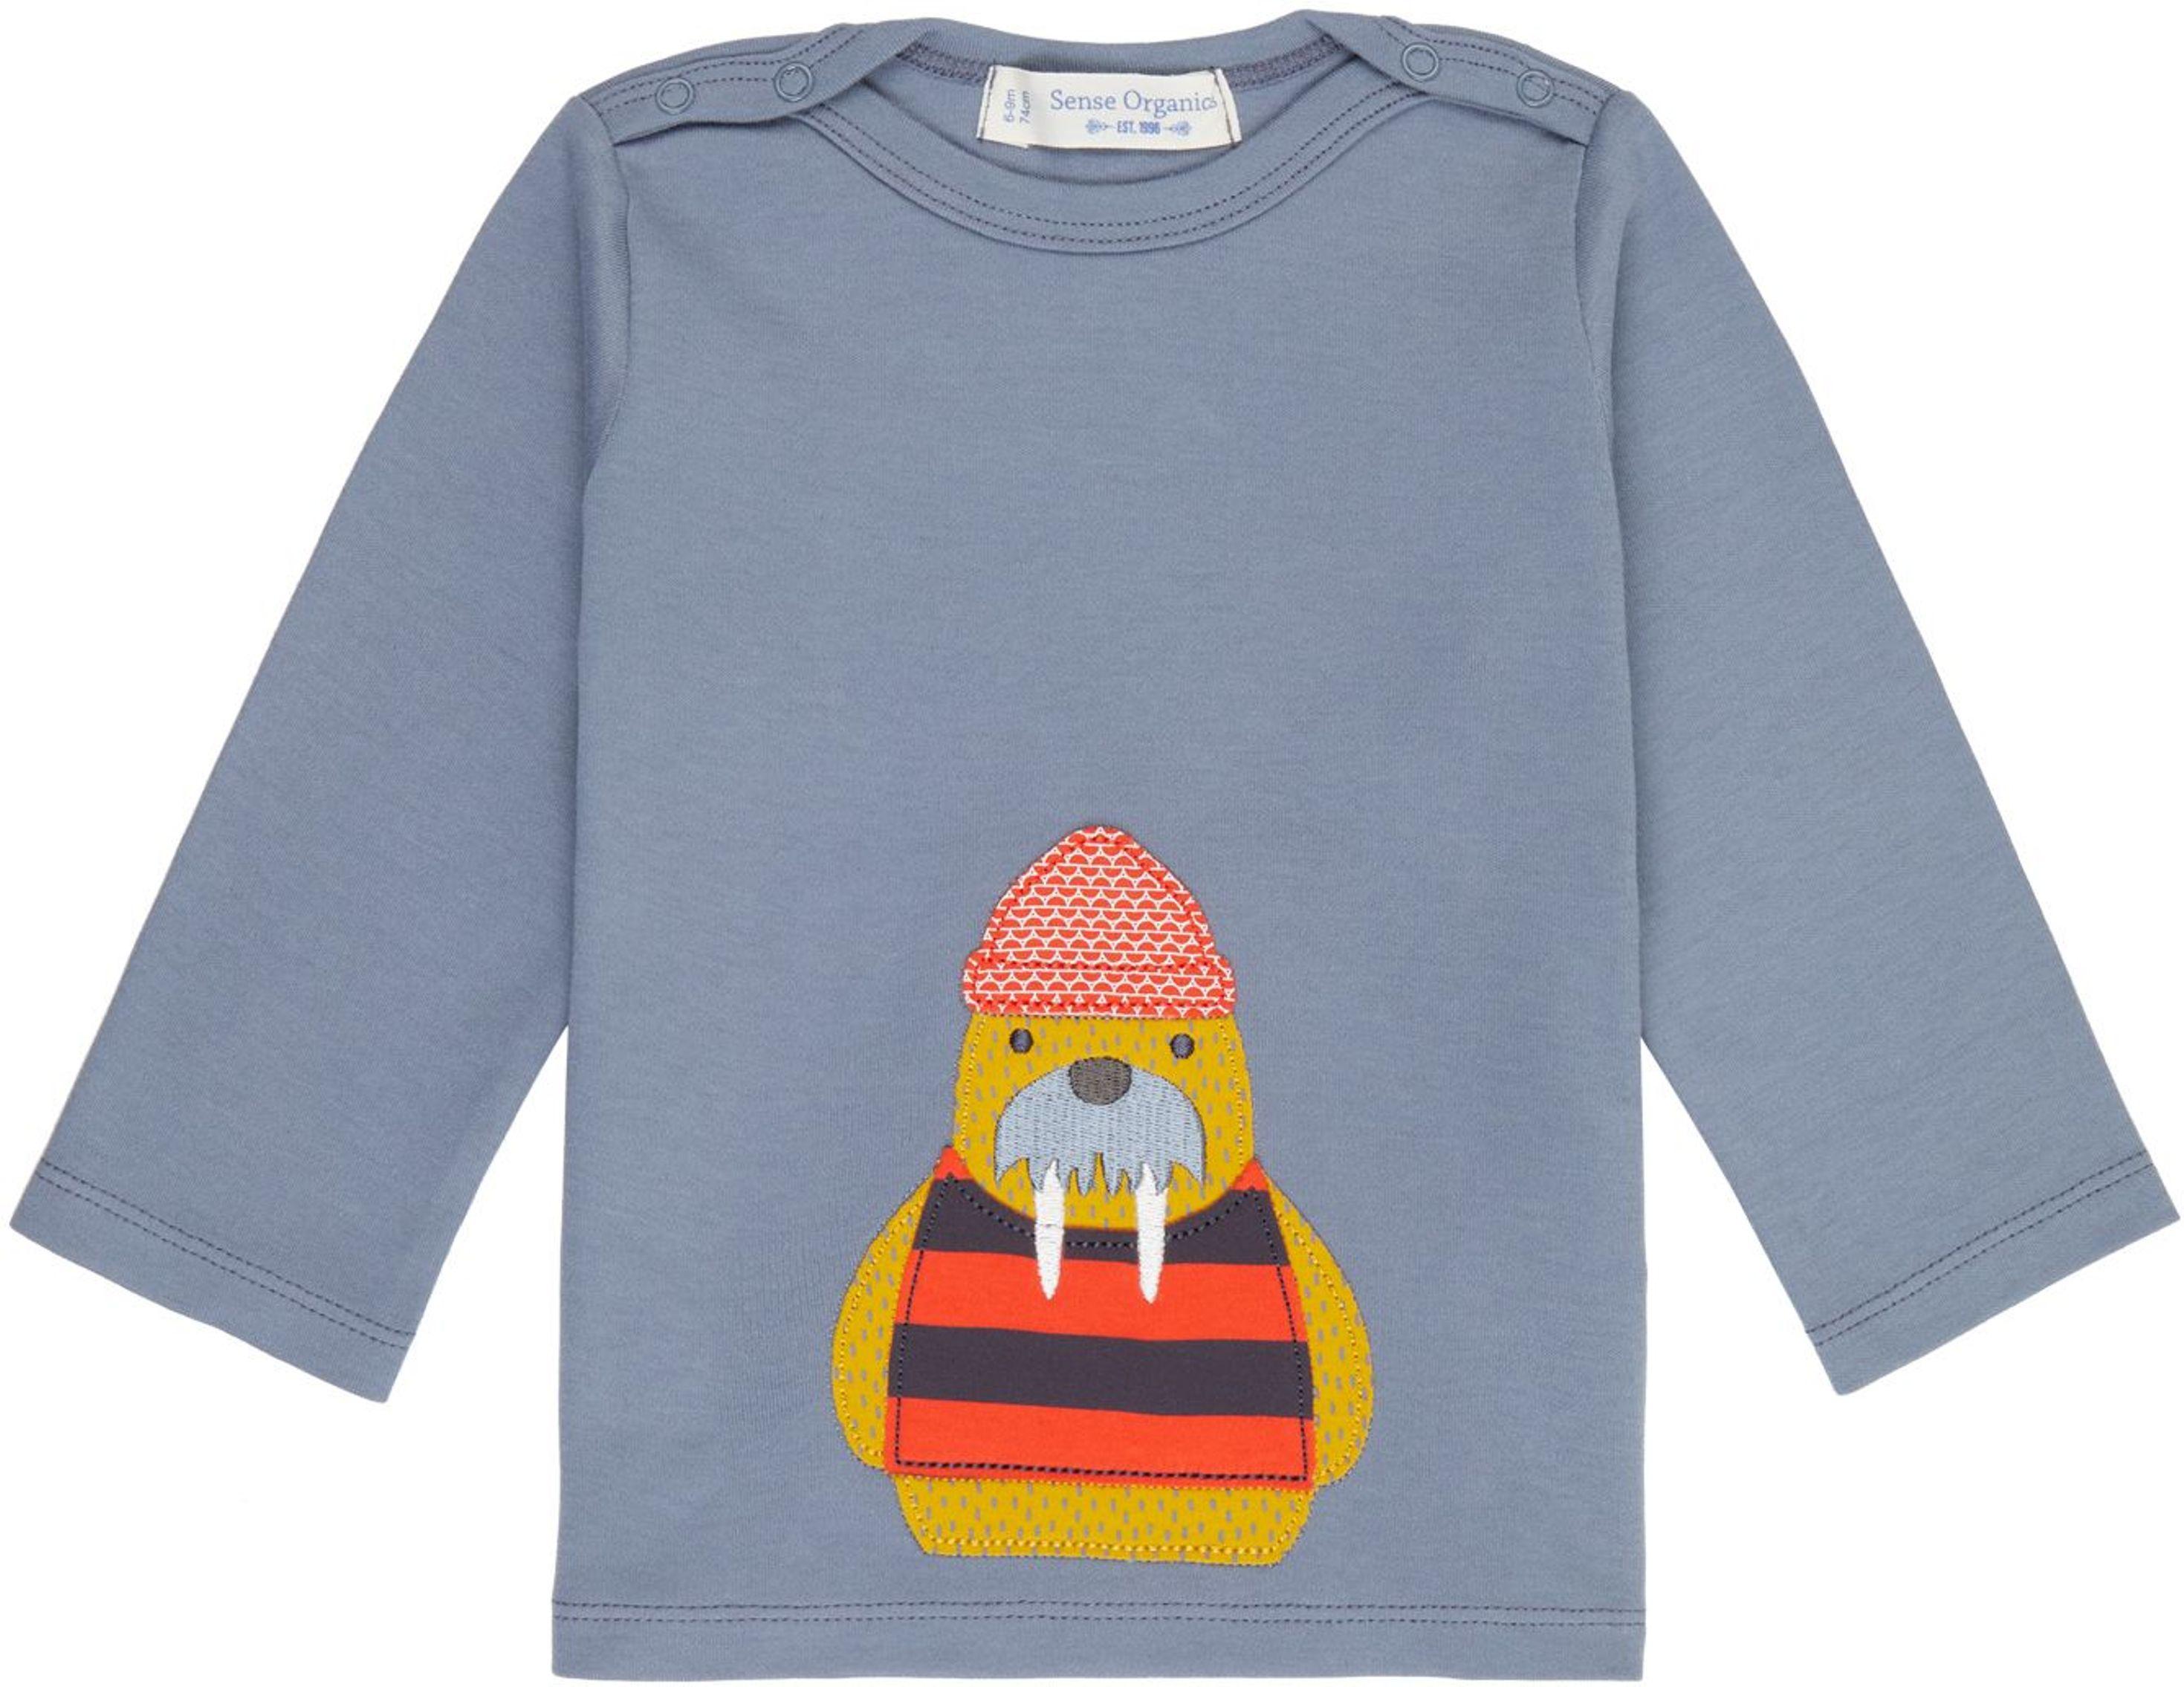 Sense Organic LUNA Baby Shirt L/S stone blue/walrus